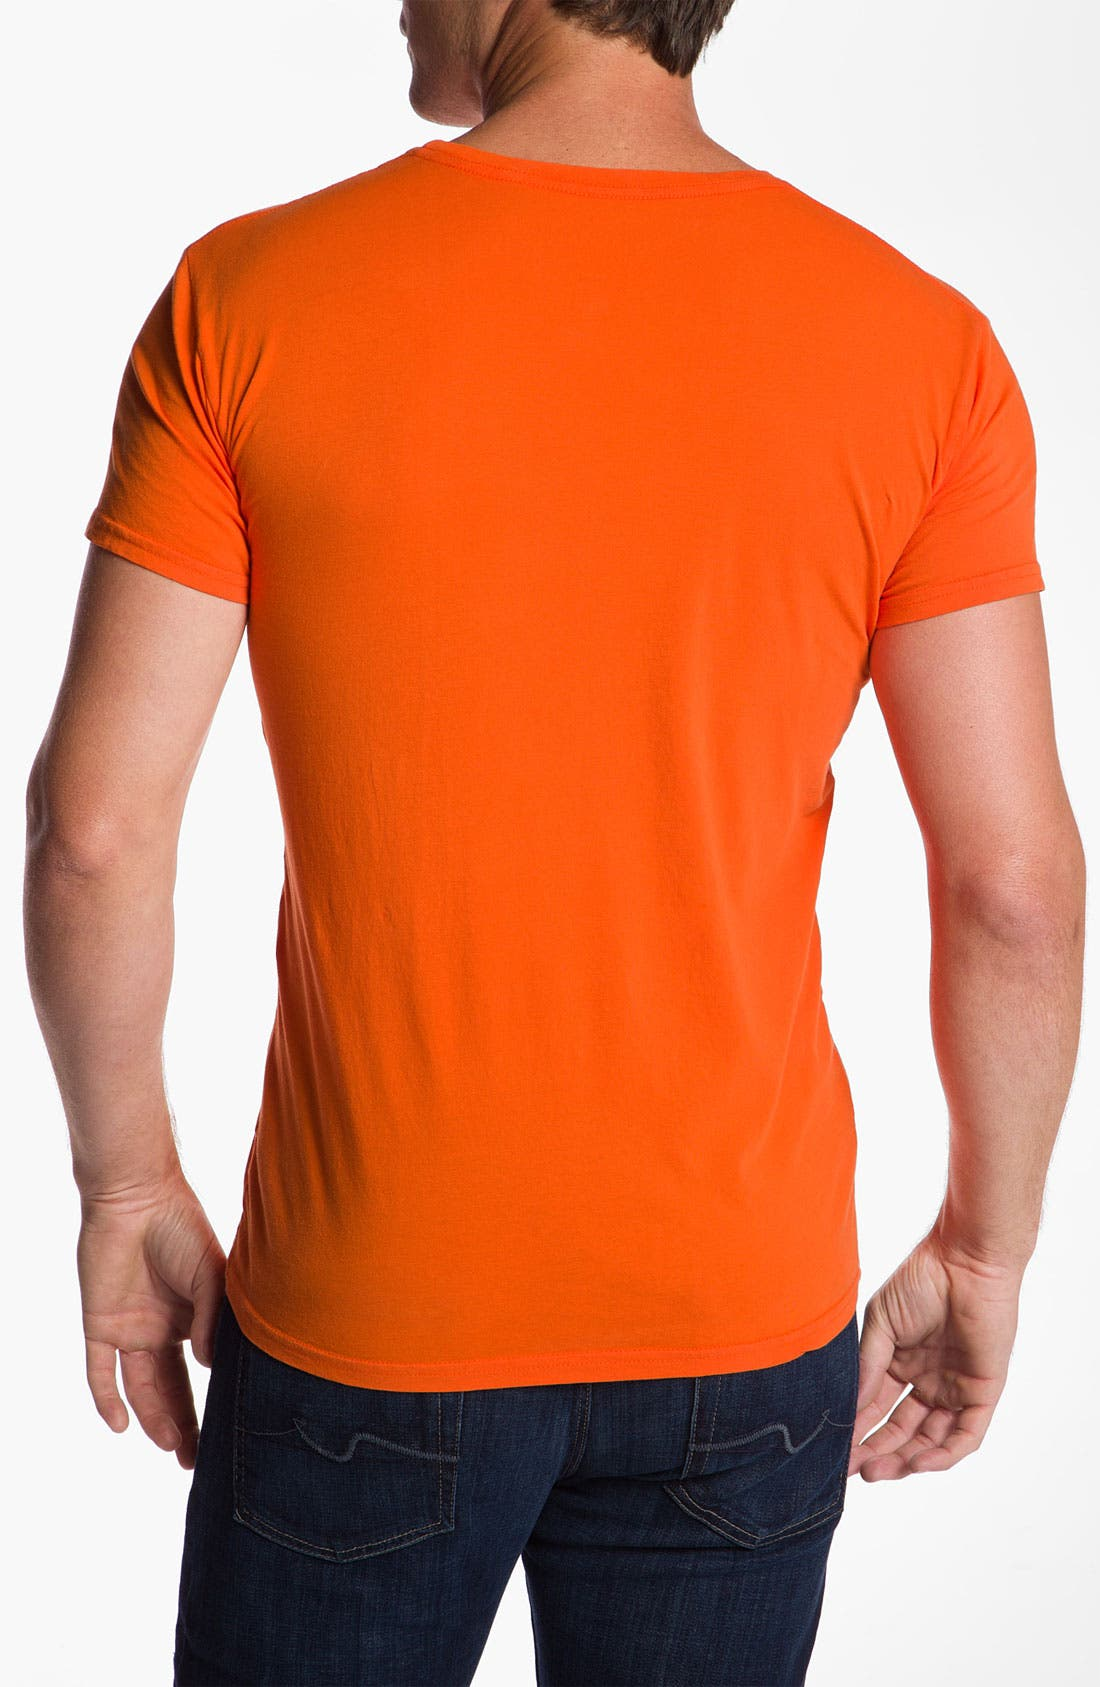 Alternate Image 2  - The Original Retro Brand 'University of Florida Gators' T-Shirt